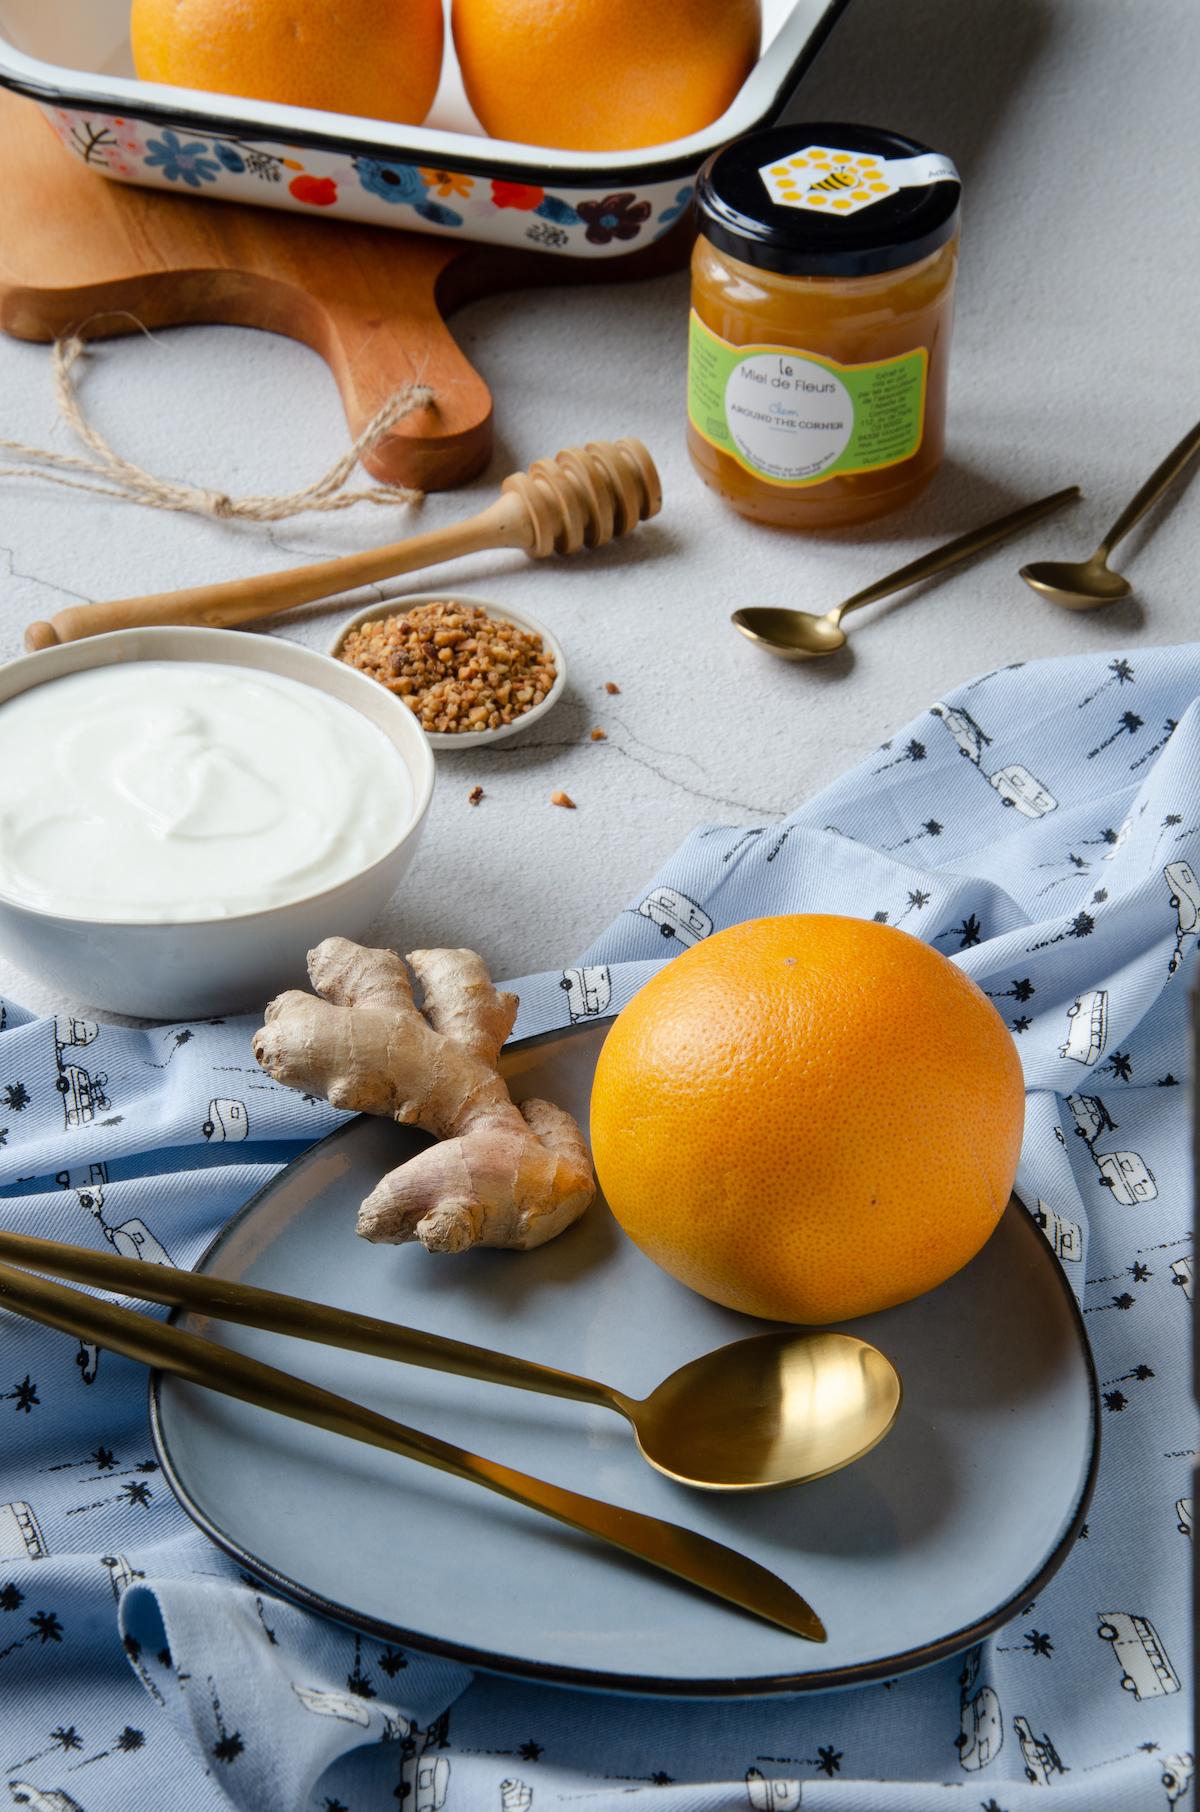 agrume au gingembre rôti au four miel